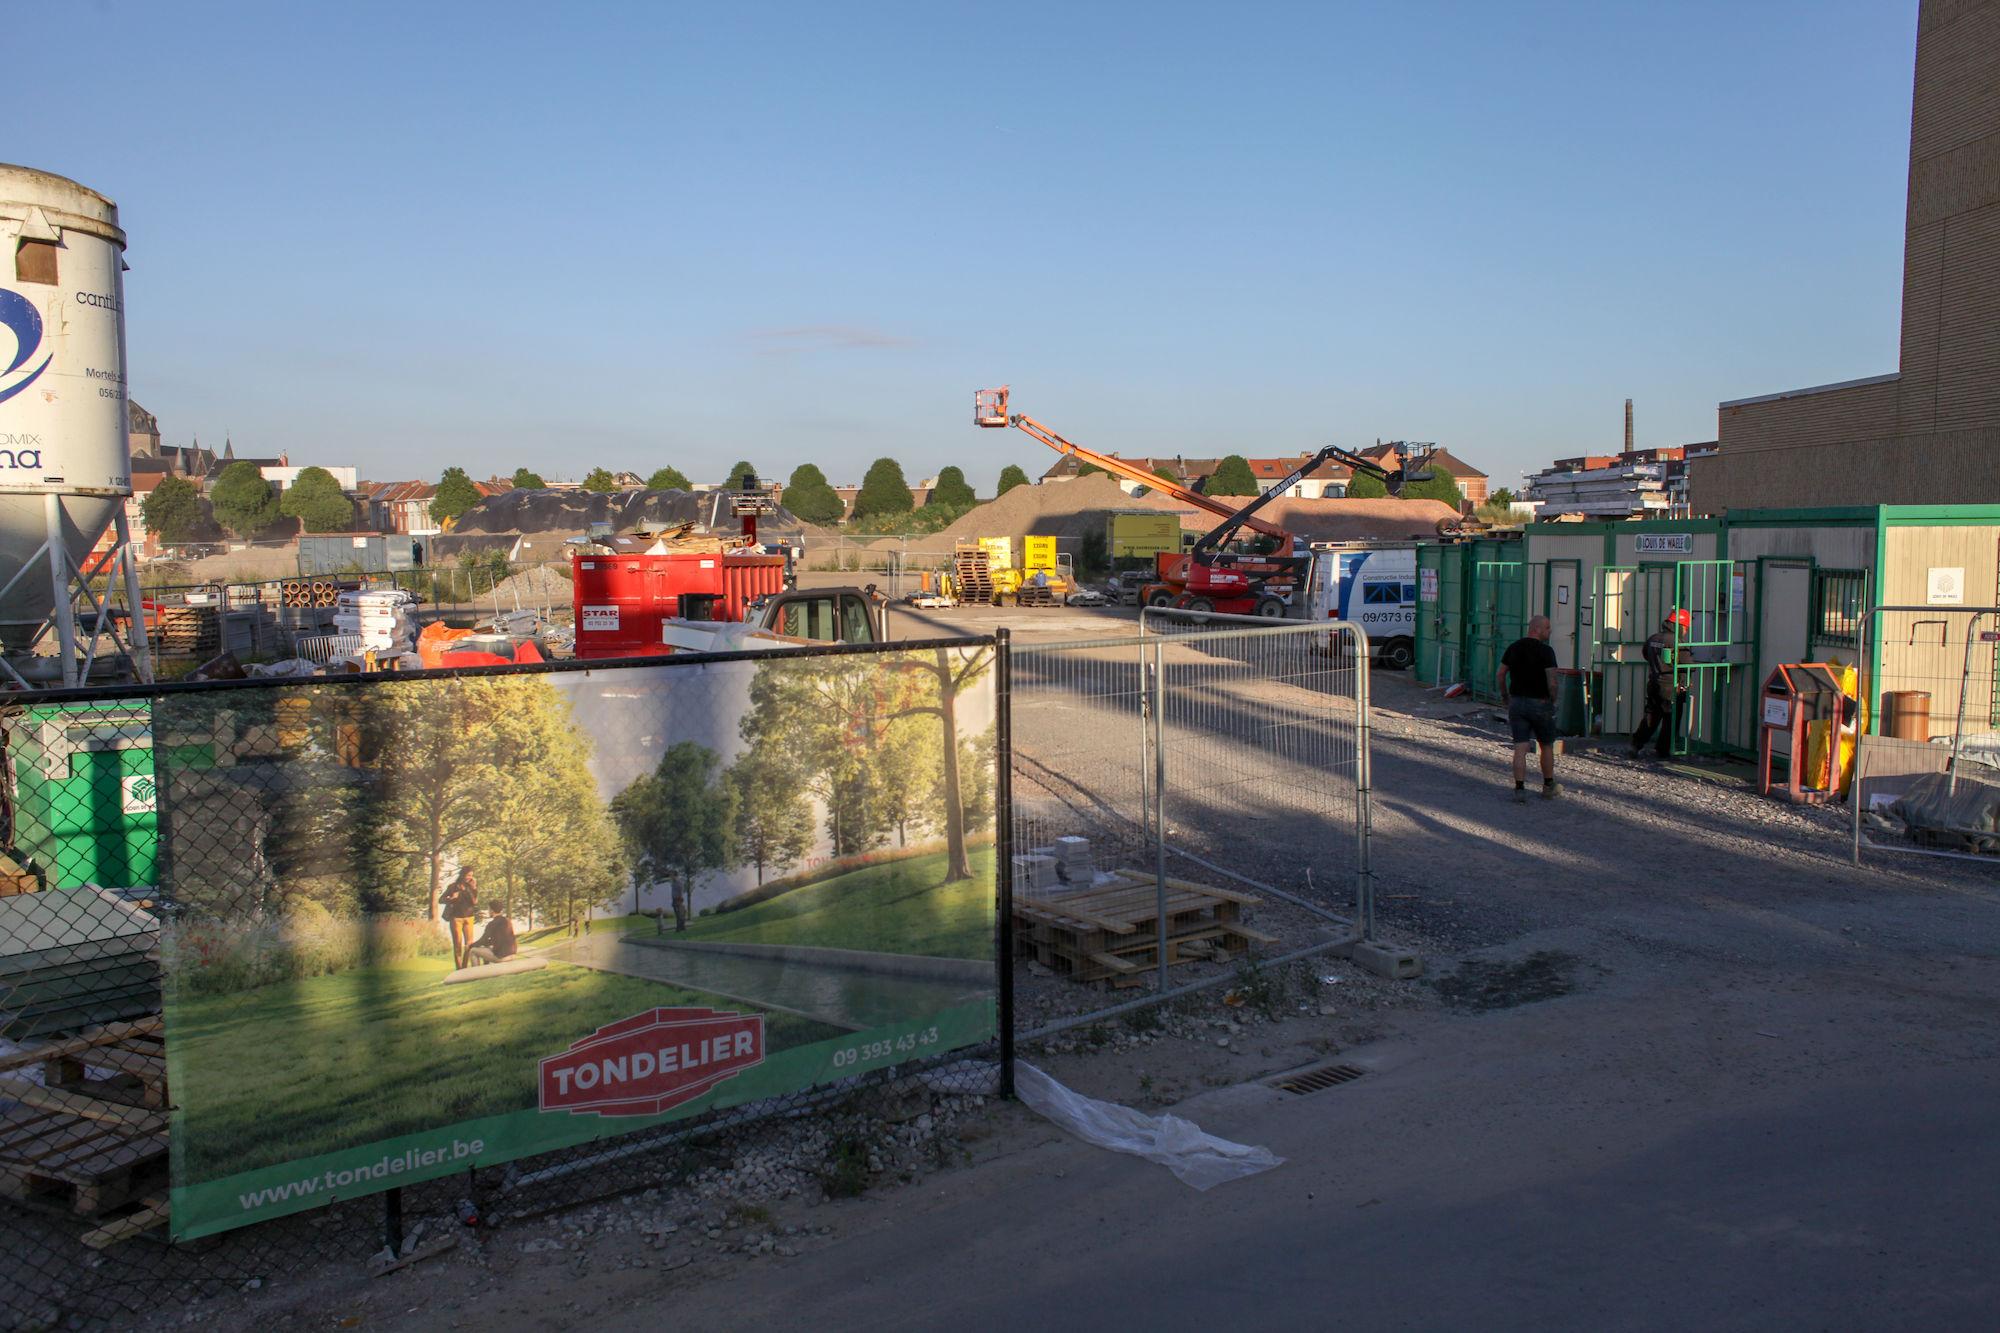 2019-07-02 Tondelier Stadsvernieuwing-27.jpg